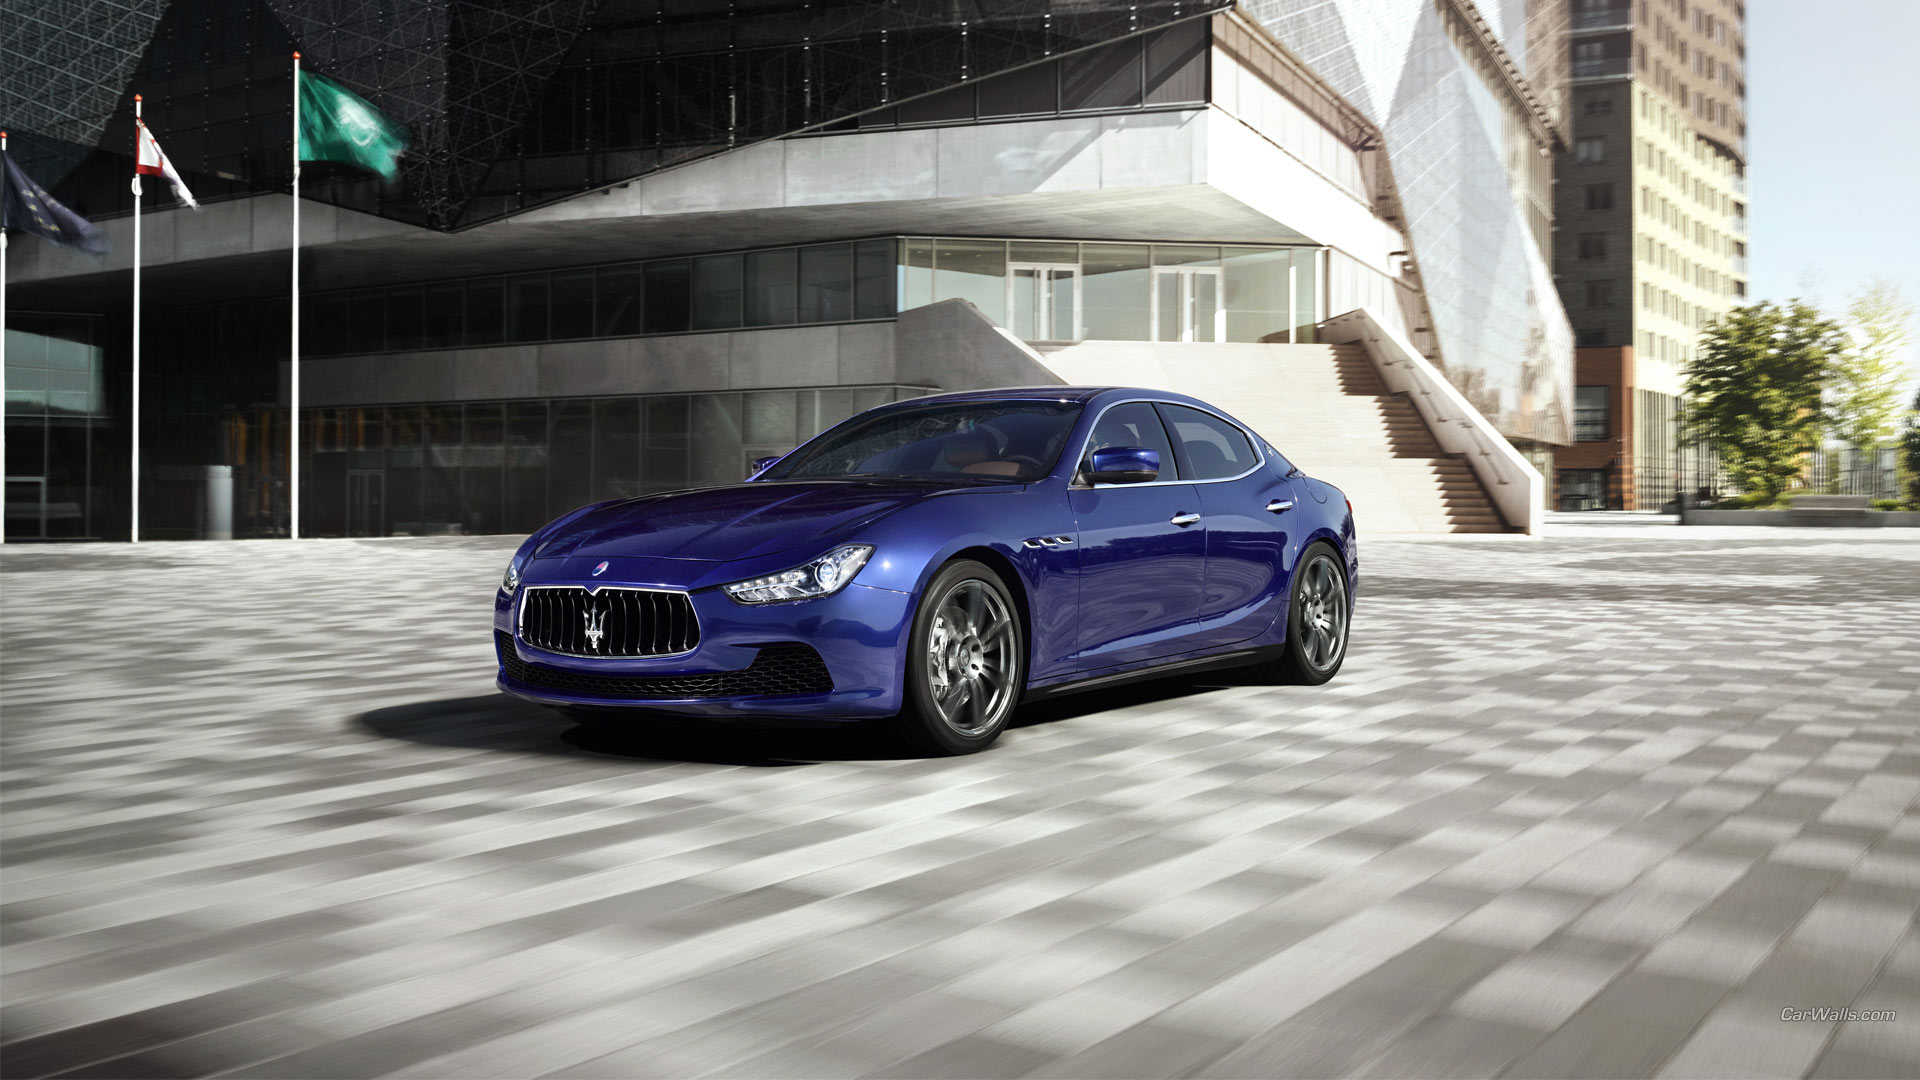 Maserati Ghibli Full HD Wallpaper and Background ...